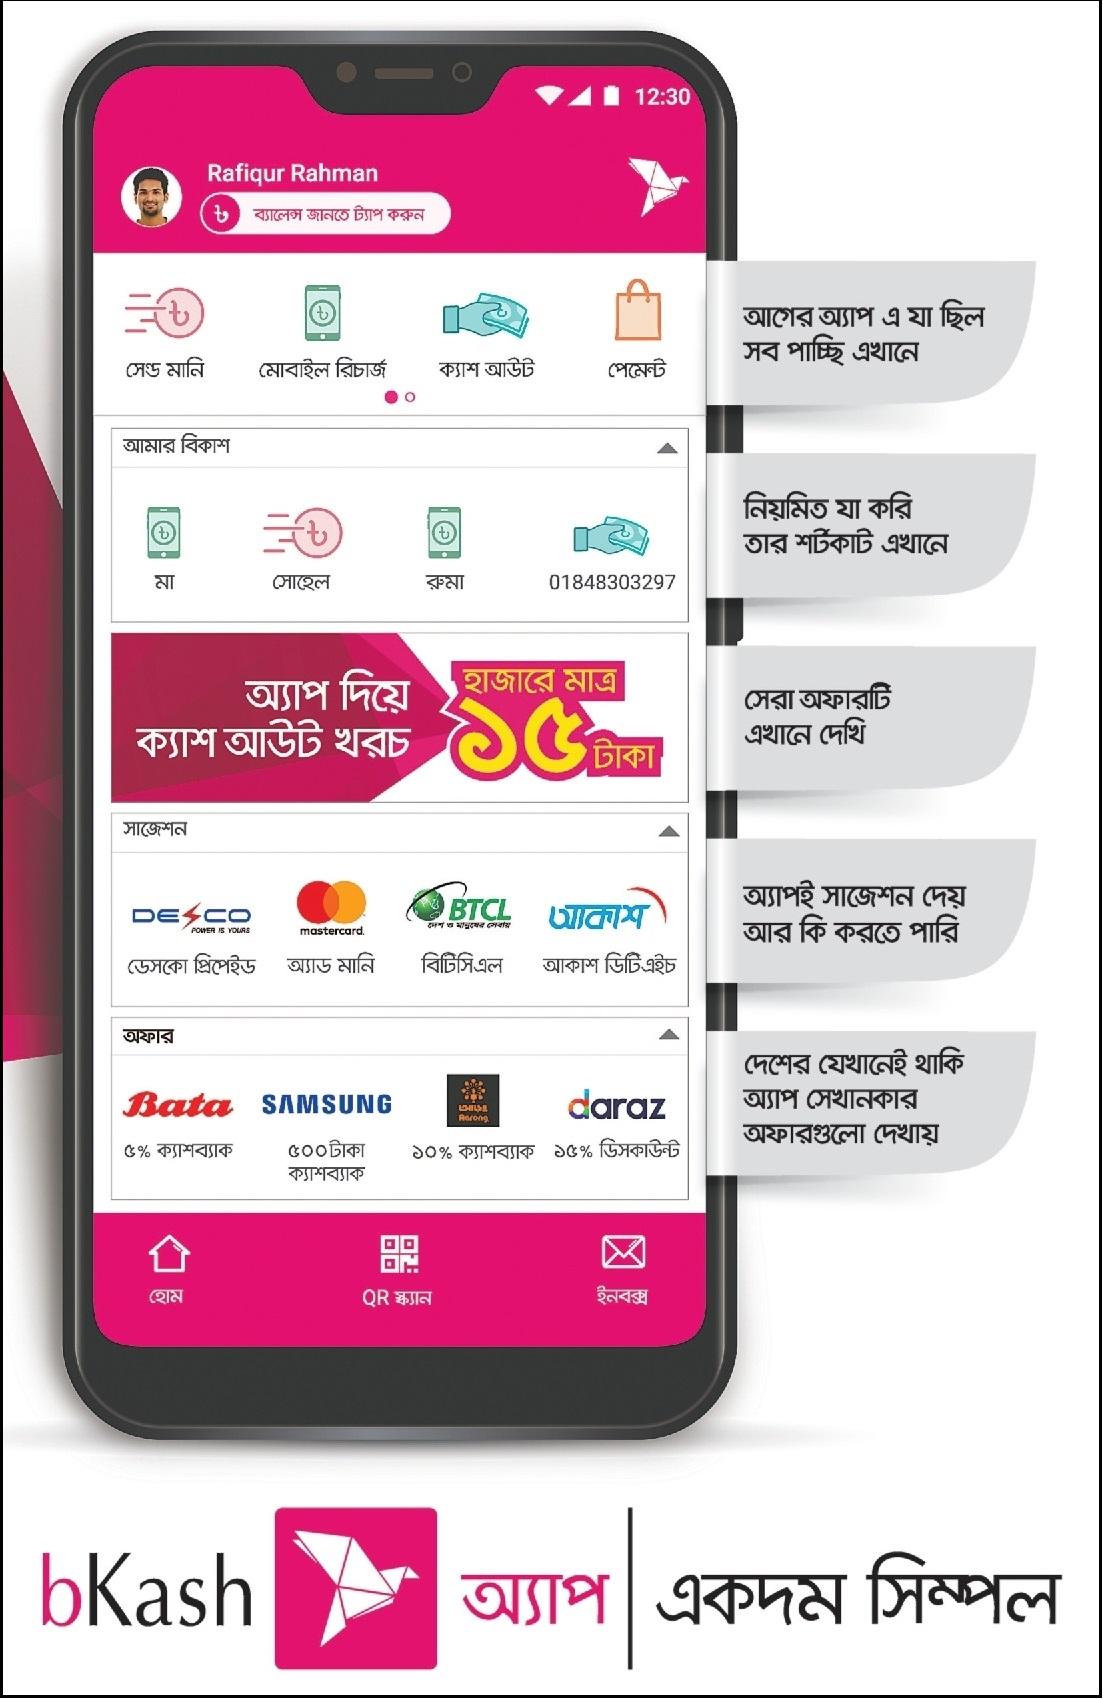 bKash App changes self-registration, lifestyle services